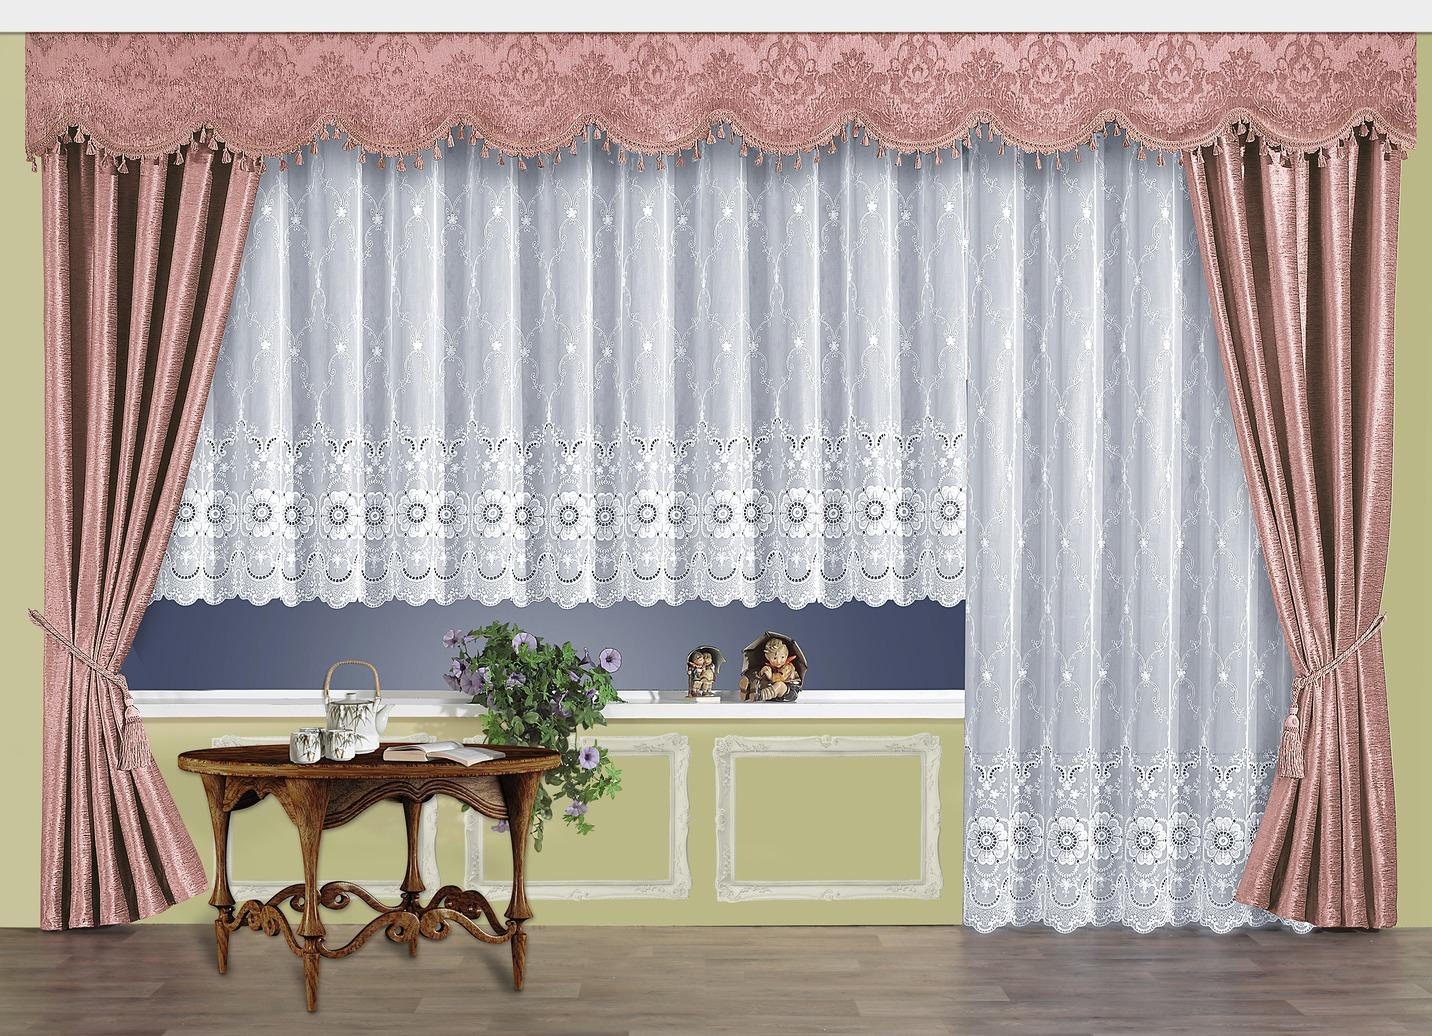 fensterdekoration verschiedene ausf hrungen vorh nge. Black Bedroom Furniture Sets. Home Design Ideas